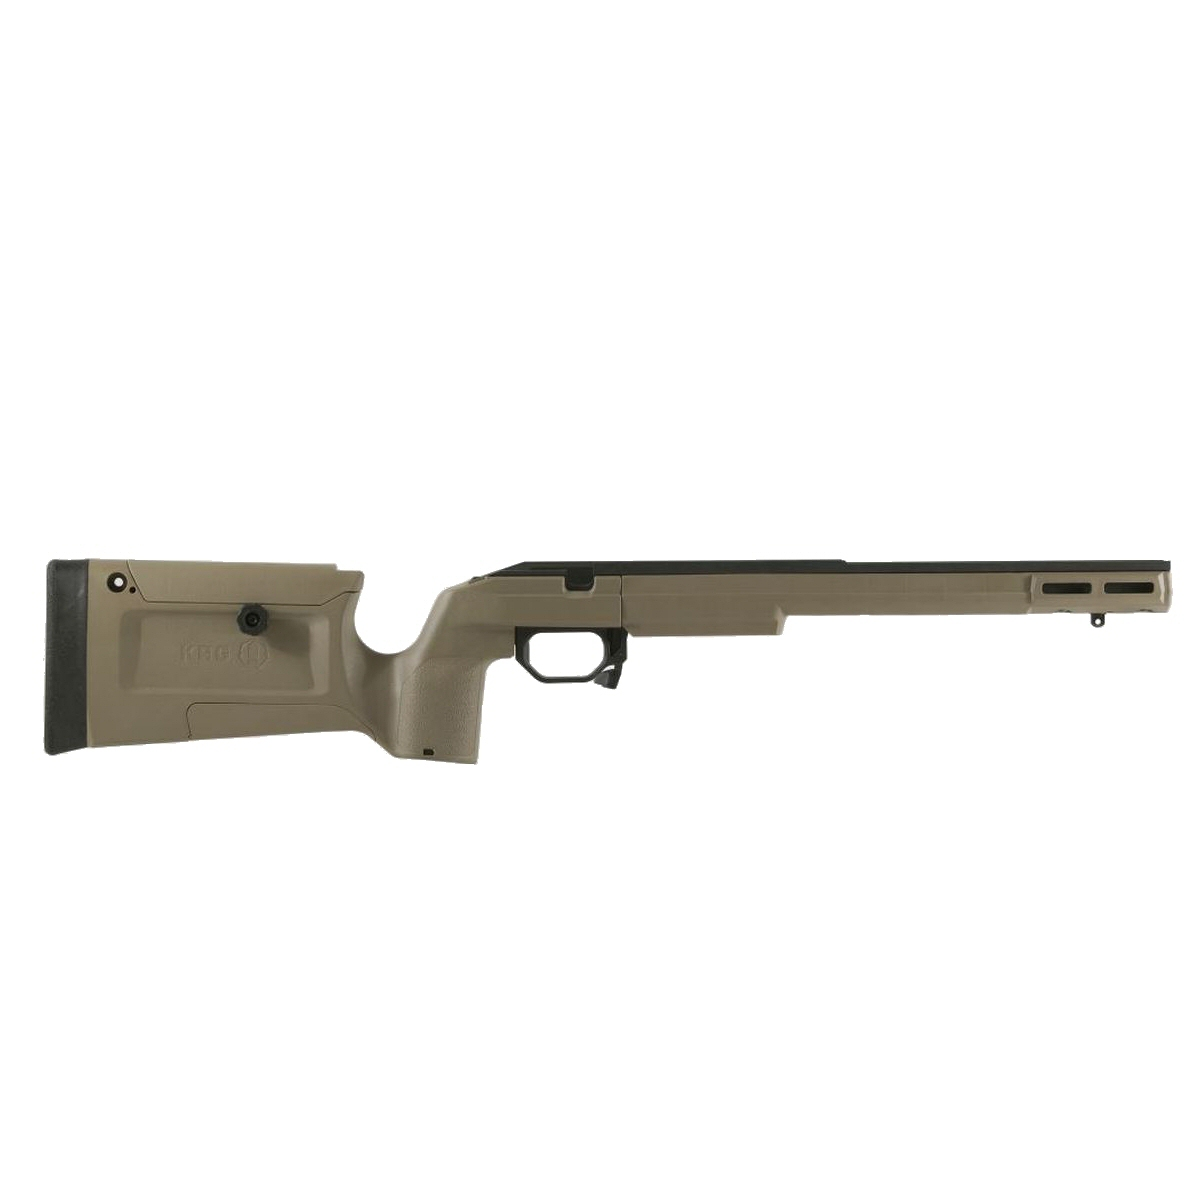 KRG Bravo Rifle Chassis Tikka T3 FDE